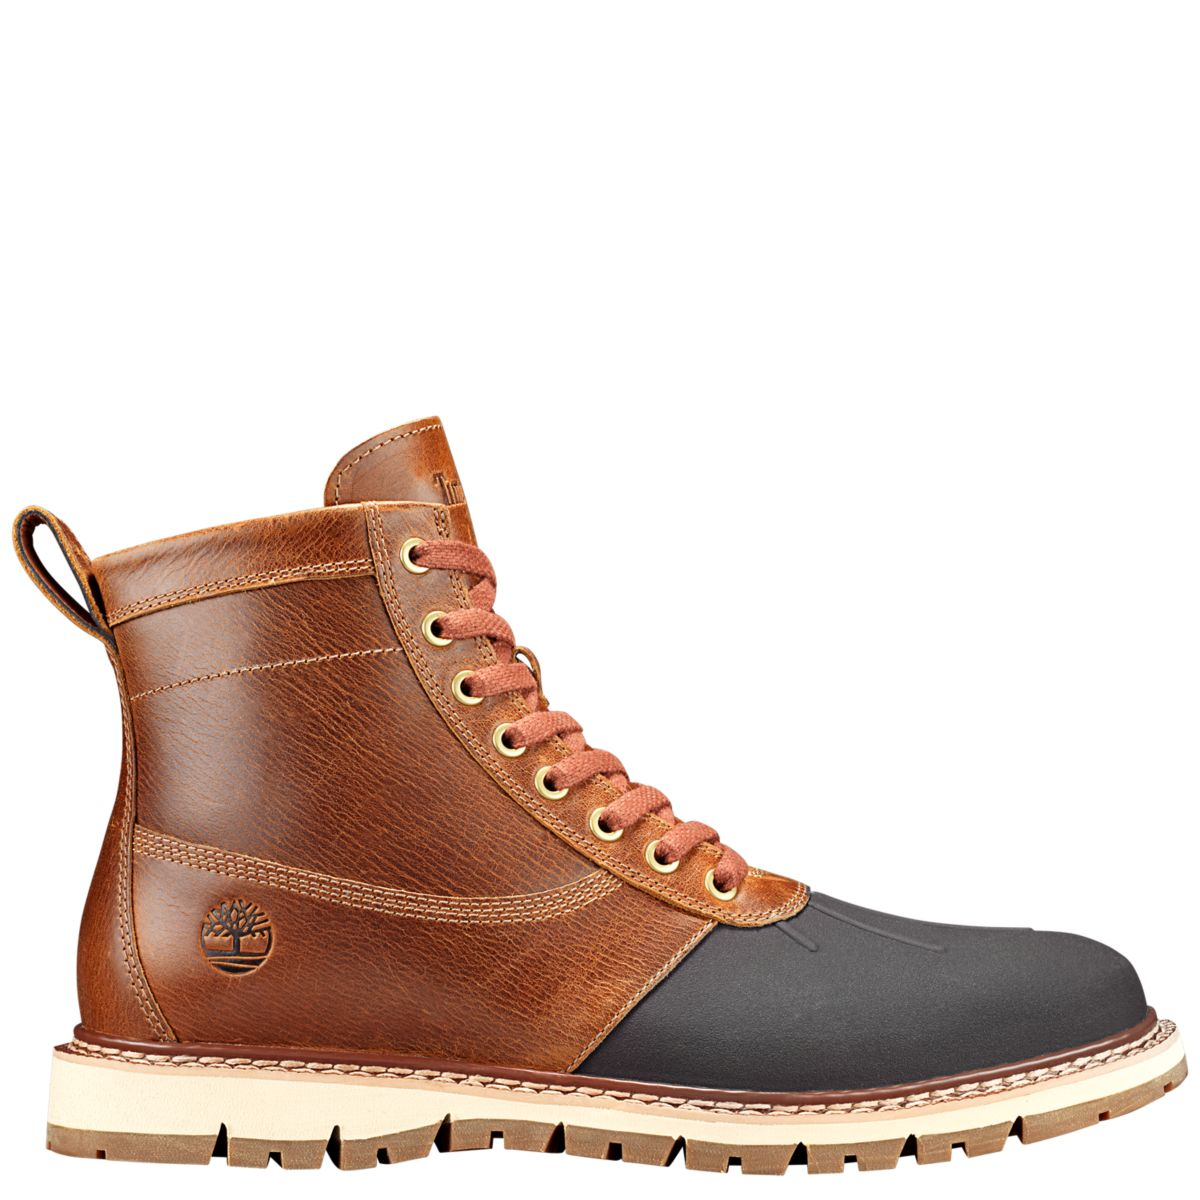 Men's Britton Hill Side-Zip Boots